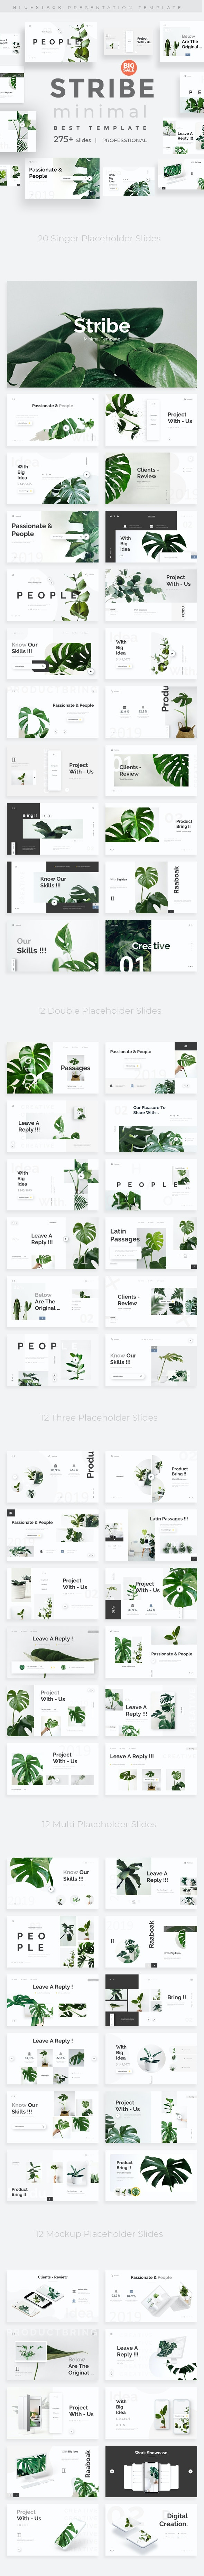 Stribe Minimal Design Keynote Template - Creative Keynote Templates